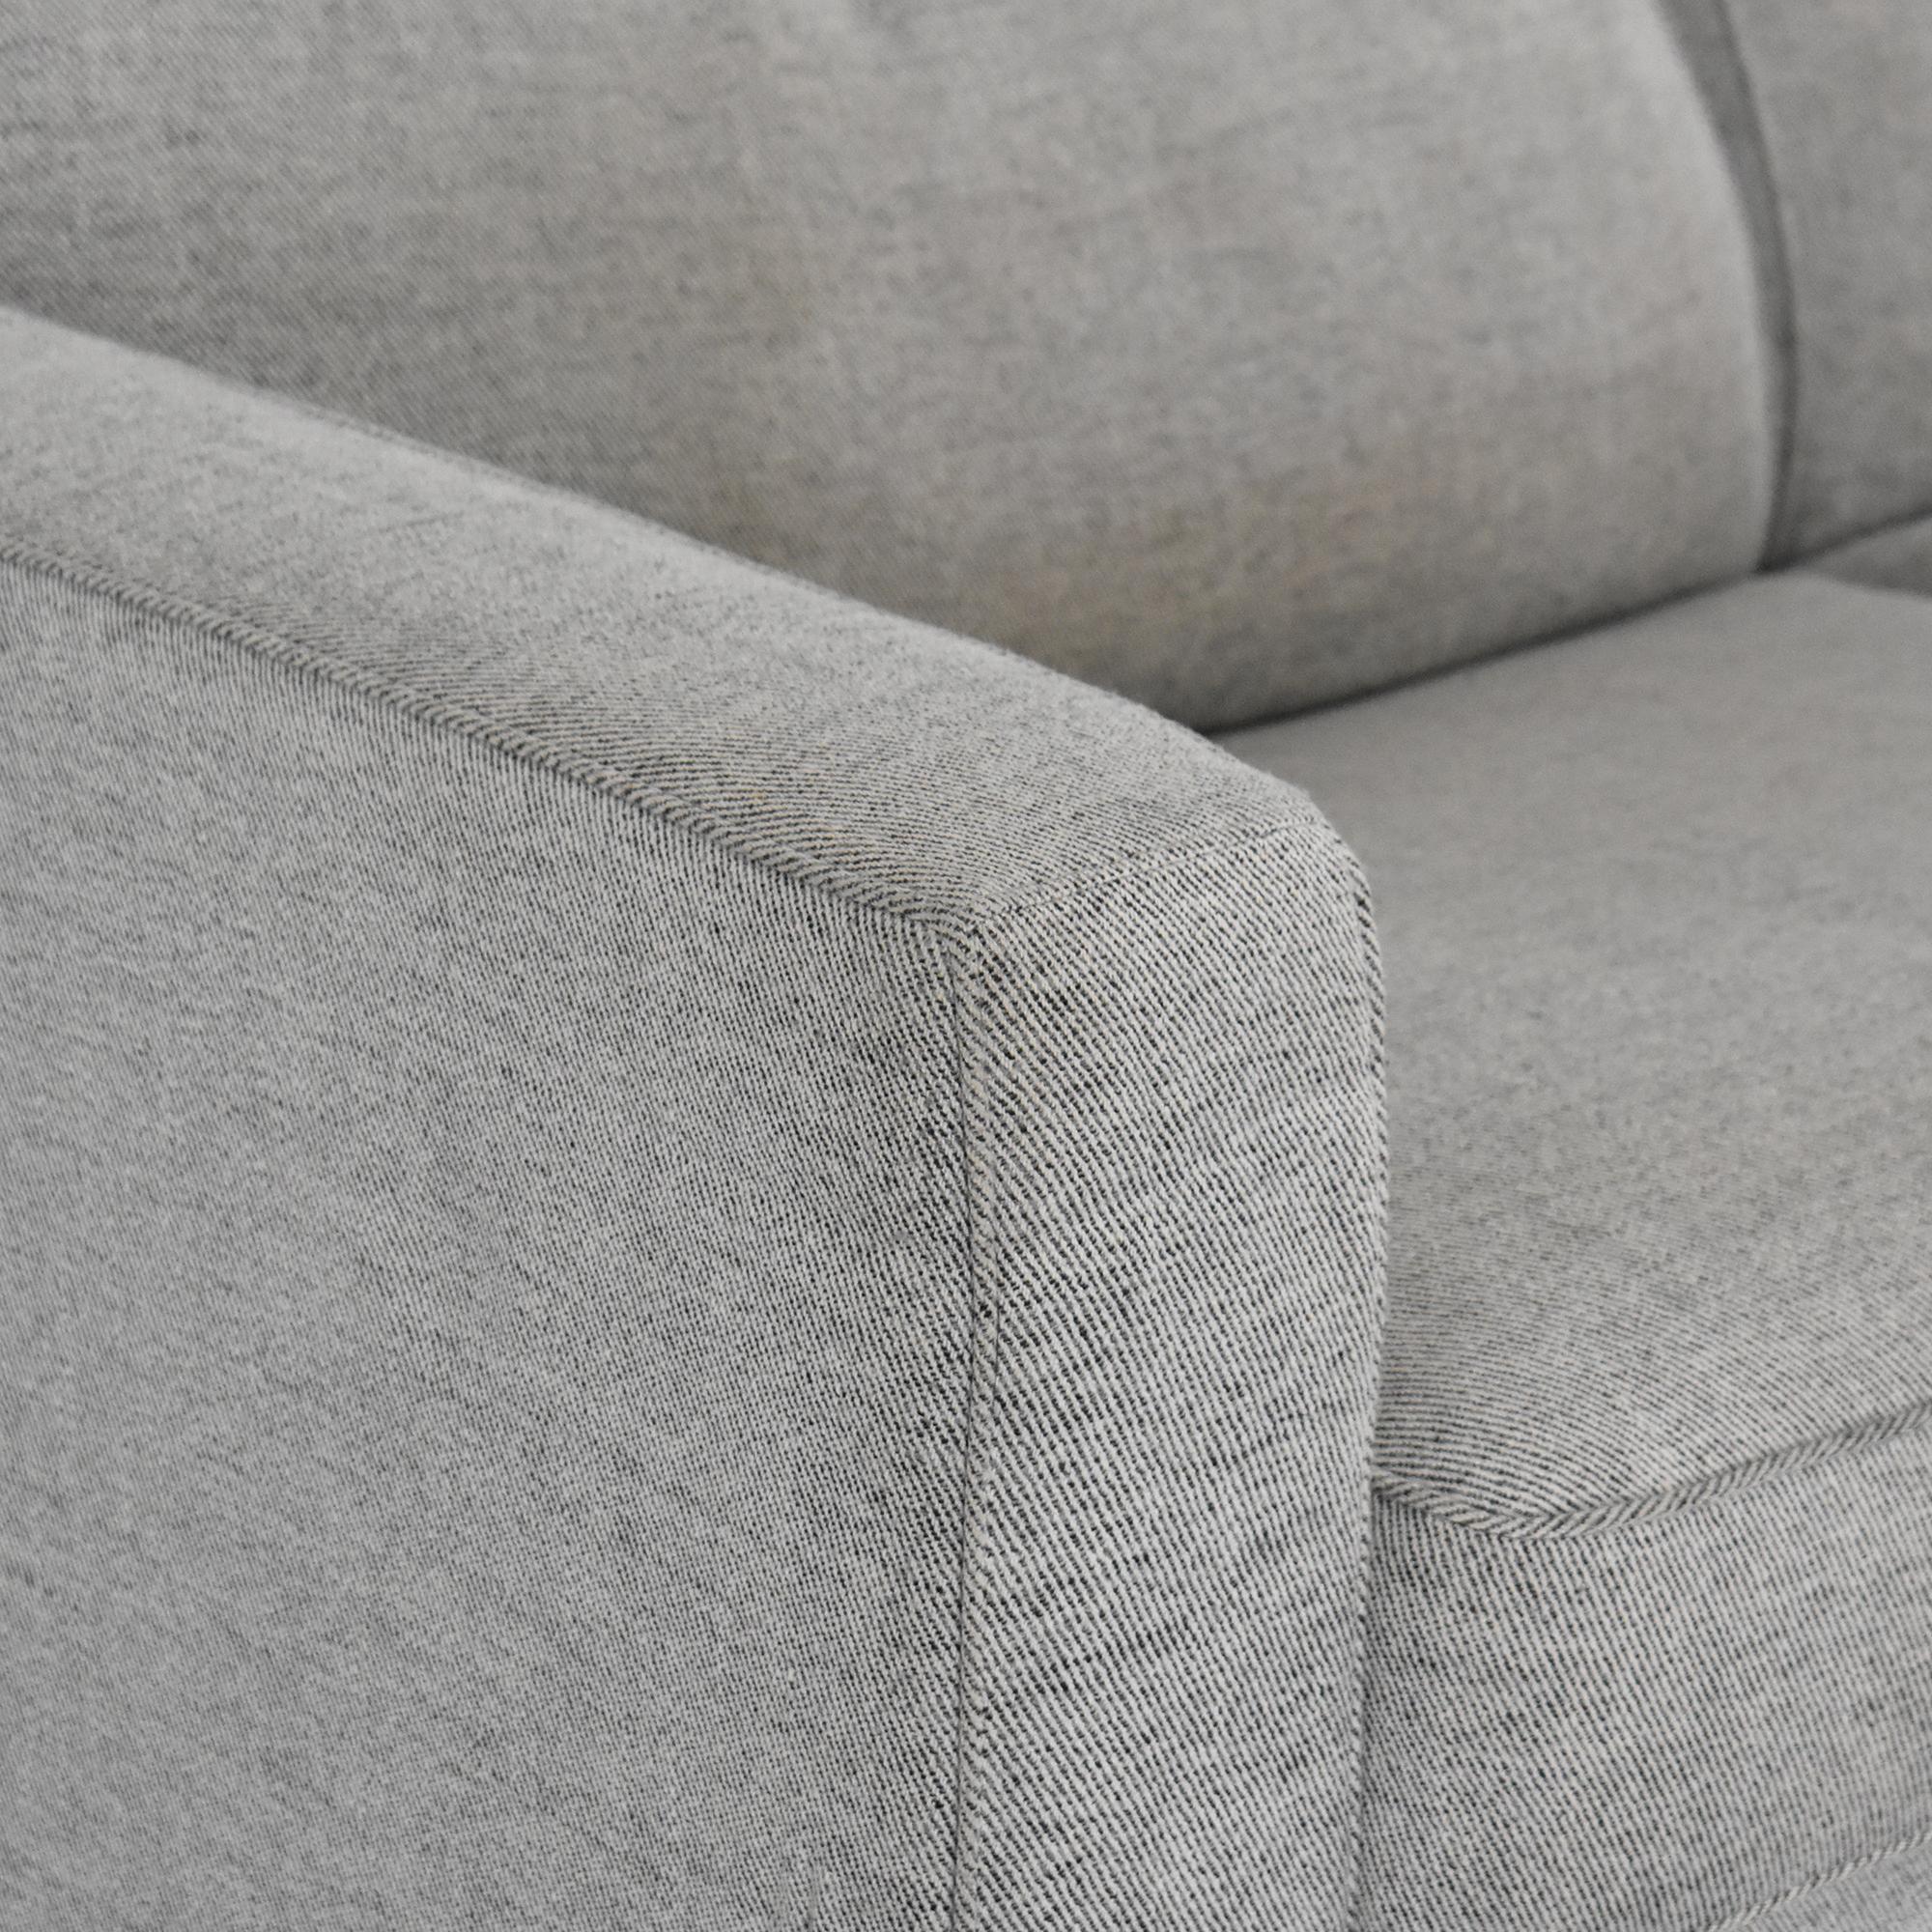 Natuzzi Natuzzi Two Cushion Sleeper Sofa on sale